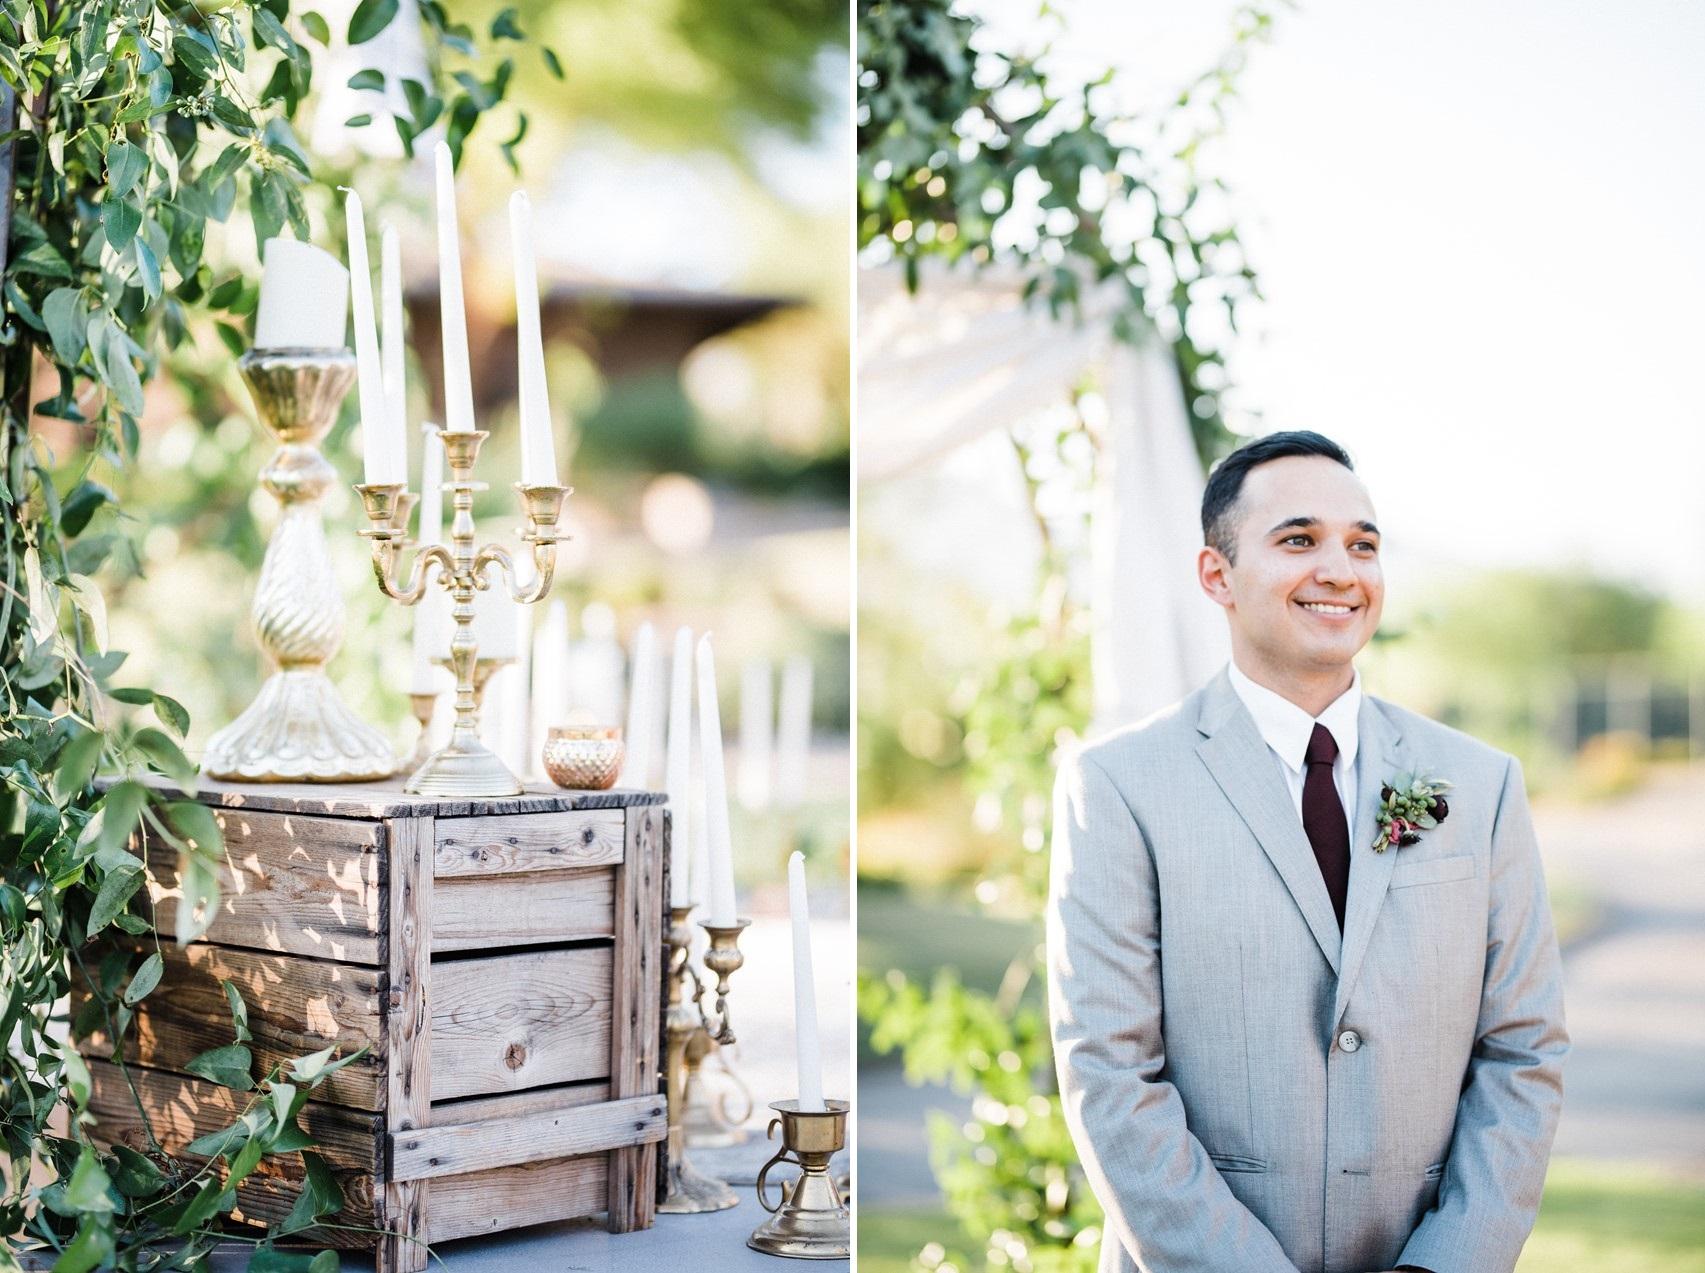 Garden Wedding Ceremony Decor